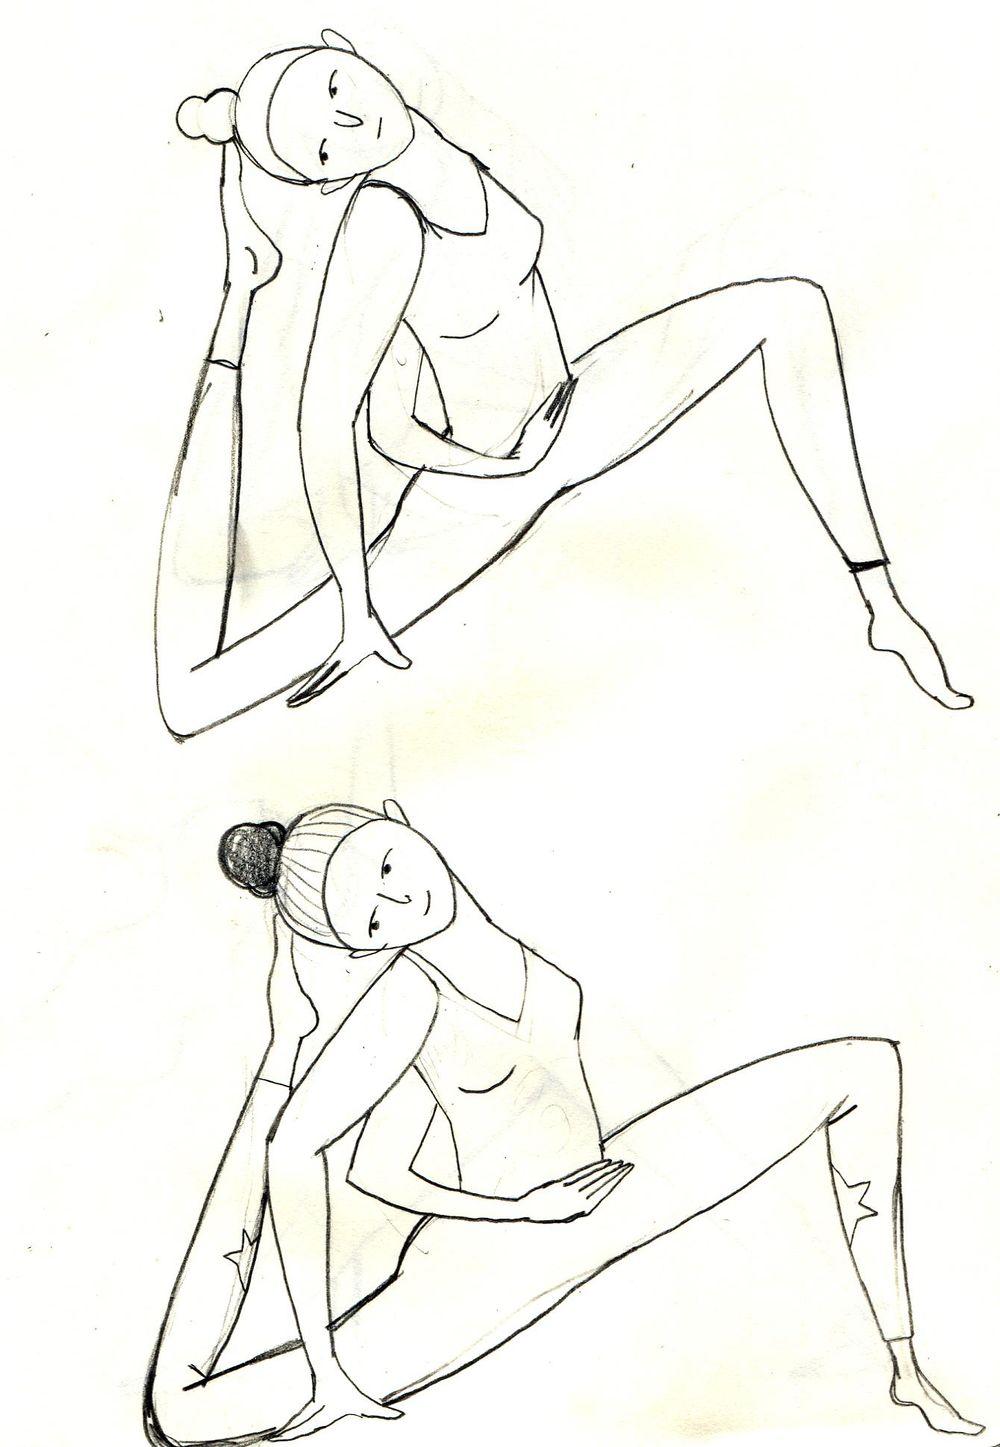 Vesushi's Odd Bodies - image 1 - student project